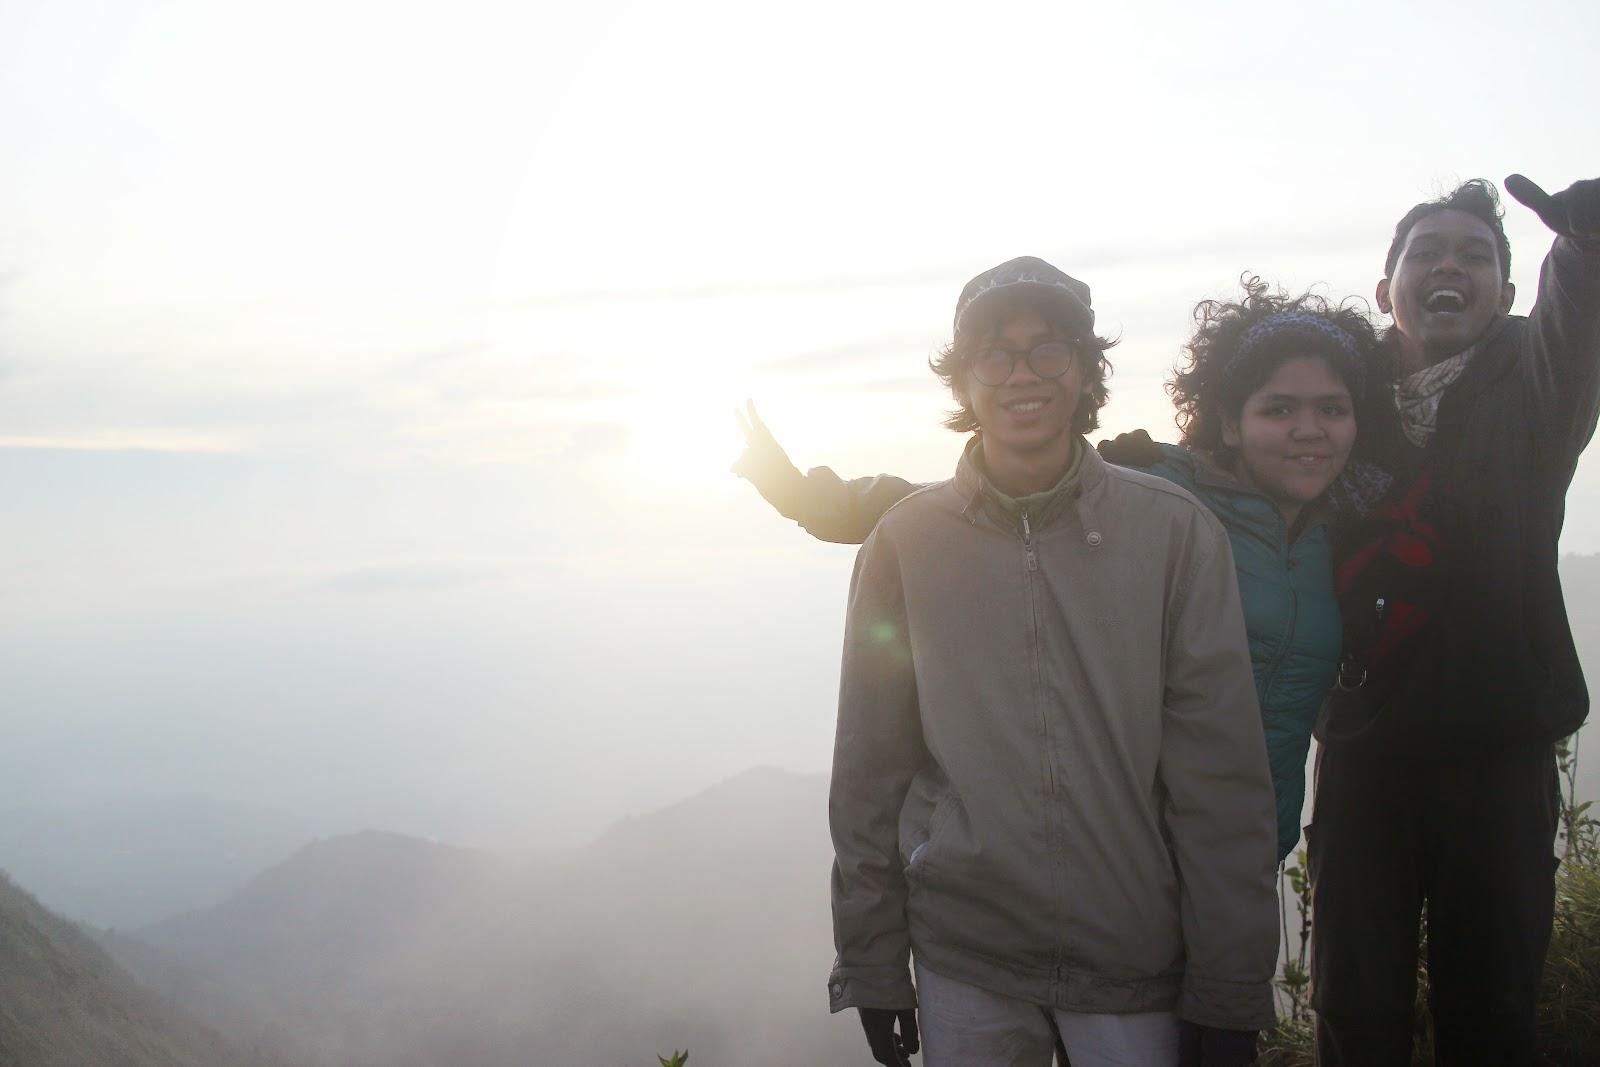 matahari pagi yang mengintip dibalik kabut